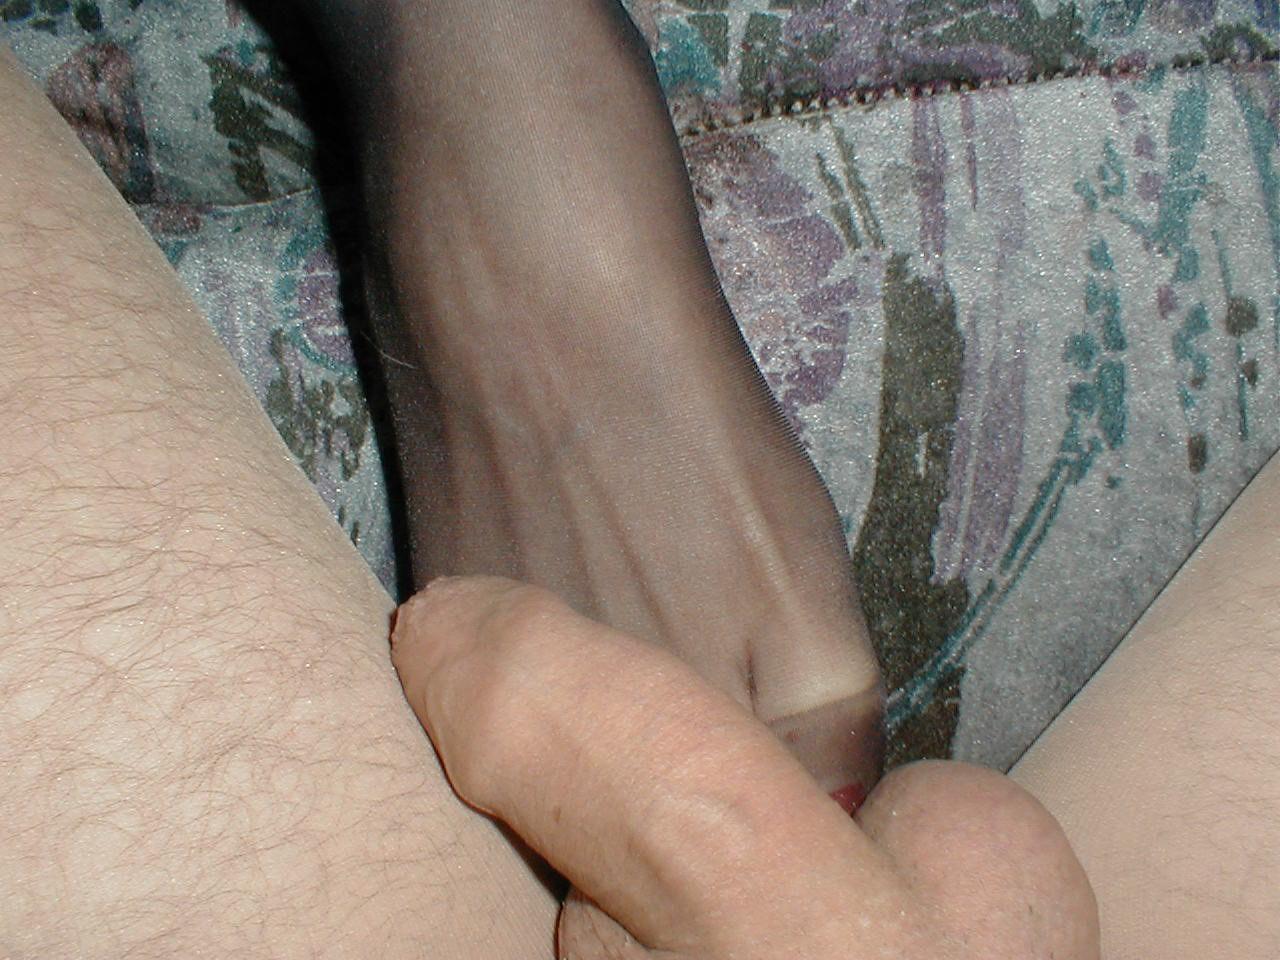 http://pbs-2.adult-empire.com/85/8570/025/pic/10.jpg